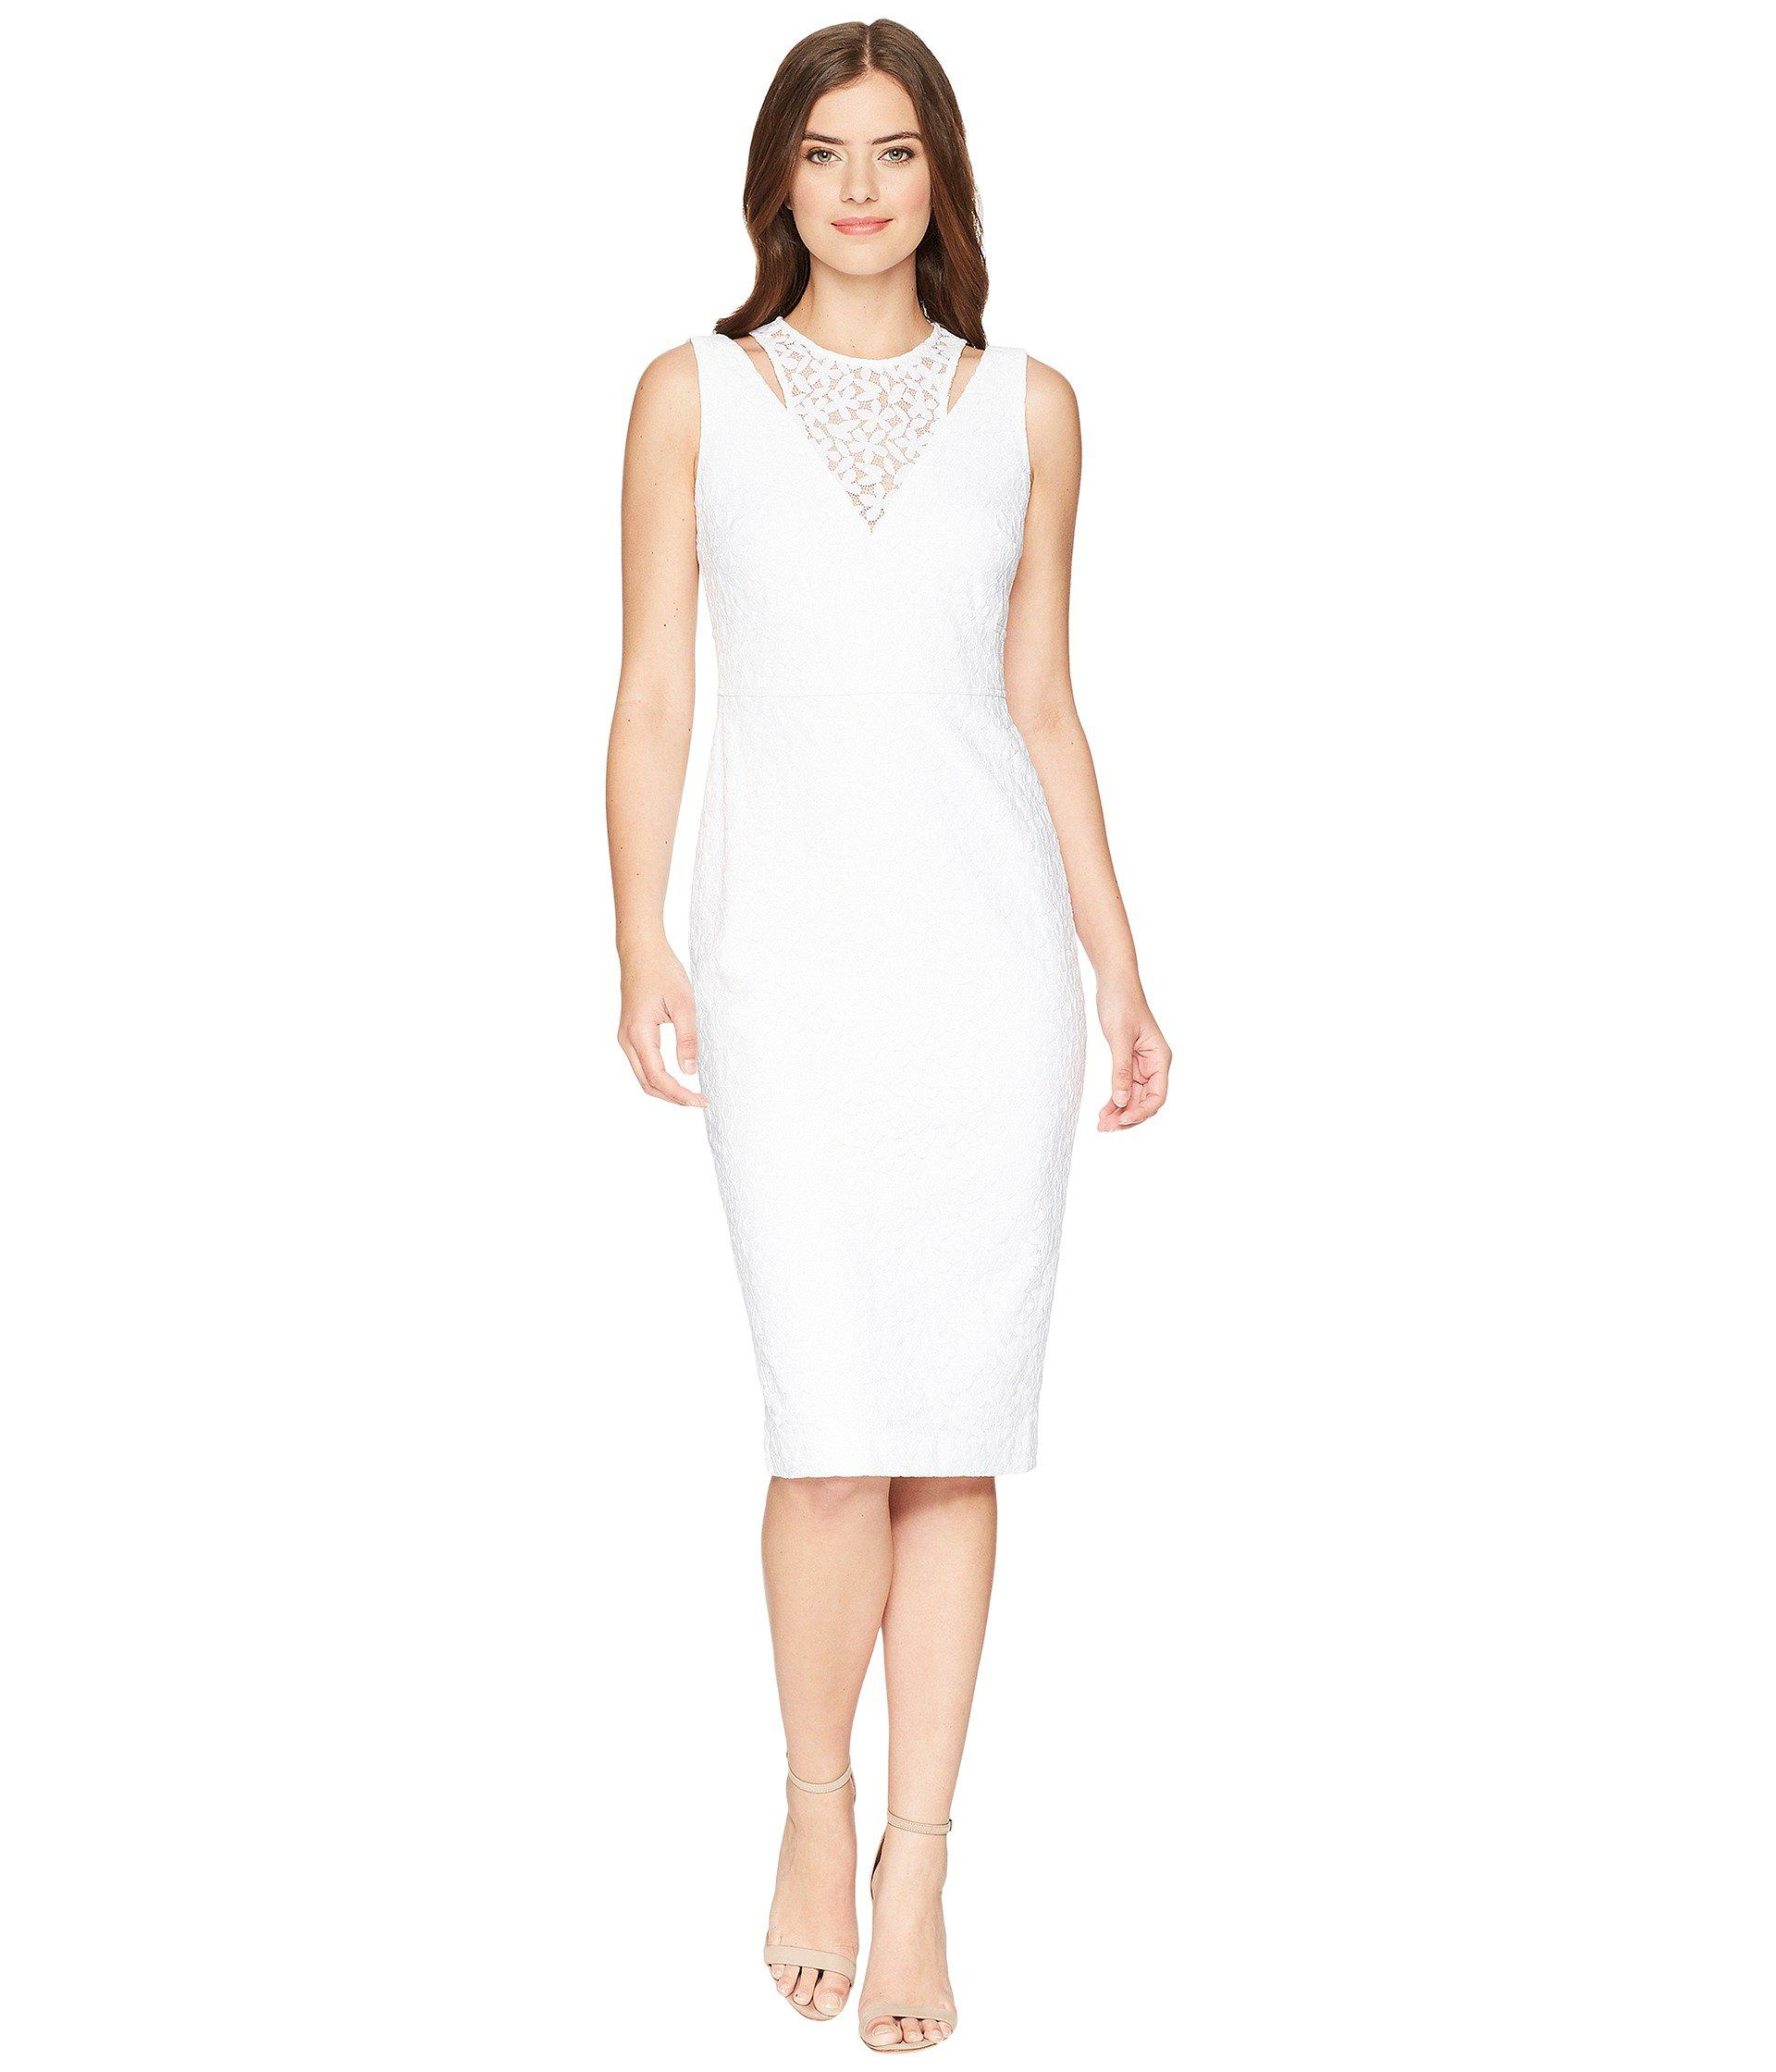 a551a34e Lyst - Calvin Klein Lace Sheath Dress With Shoulder Cut Outs ...